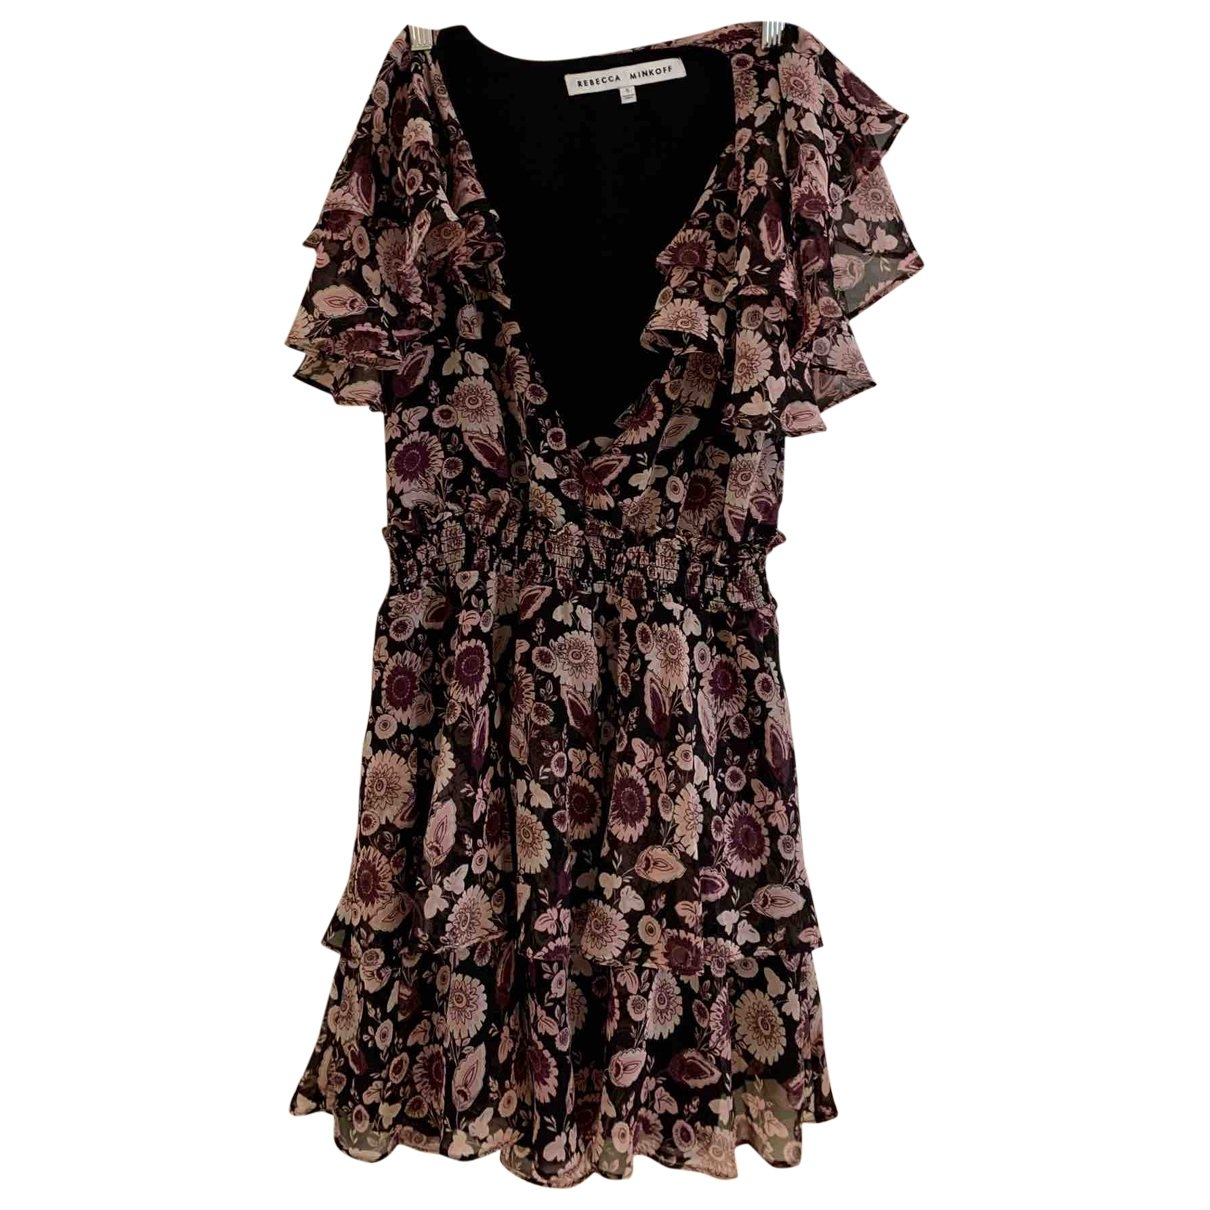 Rebecca Minkoff \N Pink skirt for Women S International